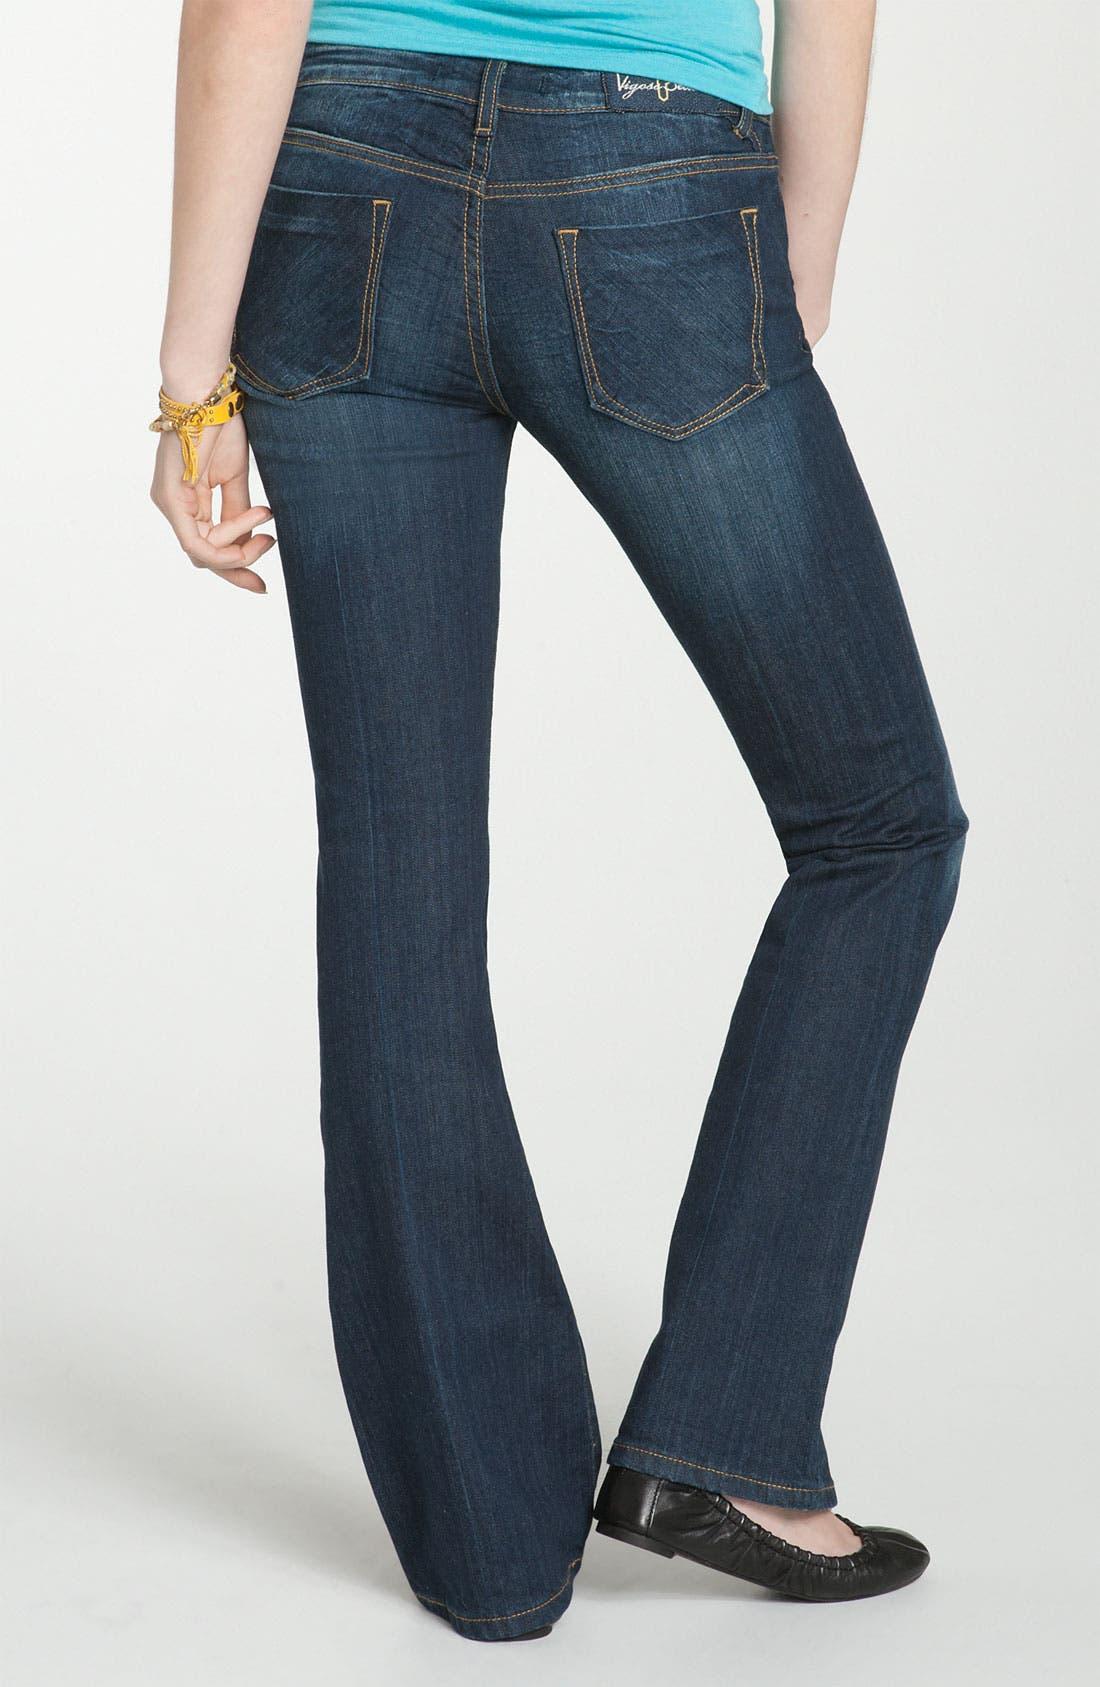 Alternate Image 1 Selected - Vigoss Bootcut Jeans (Juniors Regular & Long)